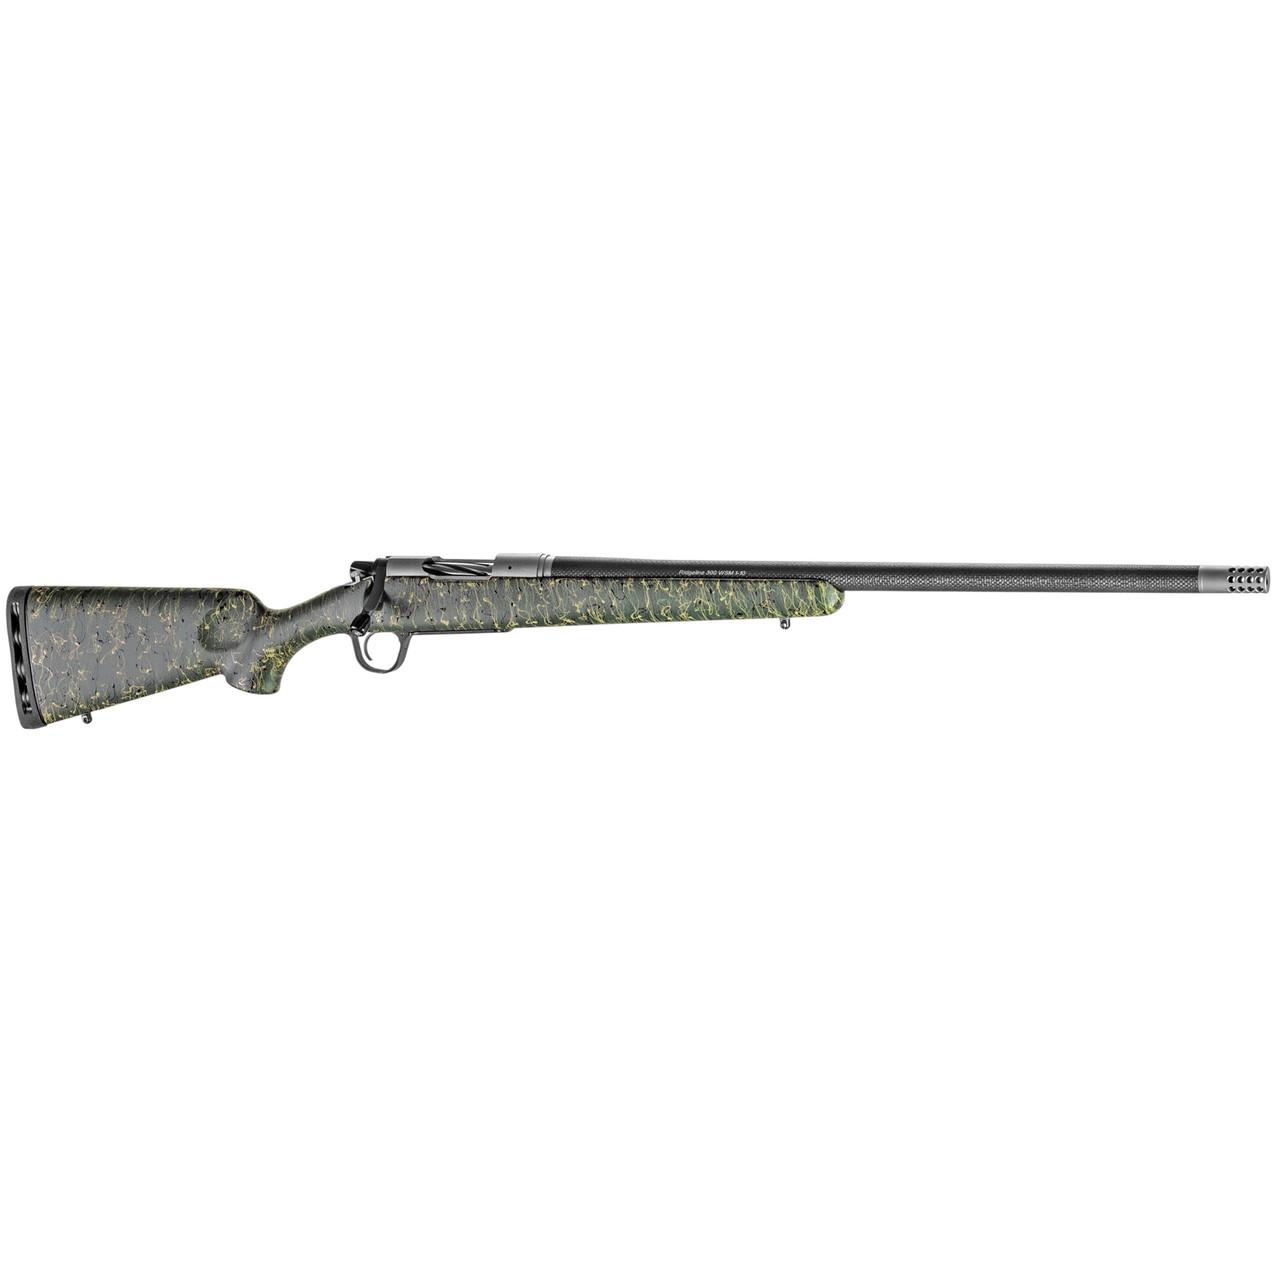 "Christensen Arms Ridgeline 26"" SS Action CALIFORNIA LEGAL - .300 Win Mag - Green w/ Black & Tan Webbing"